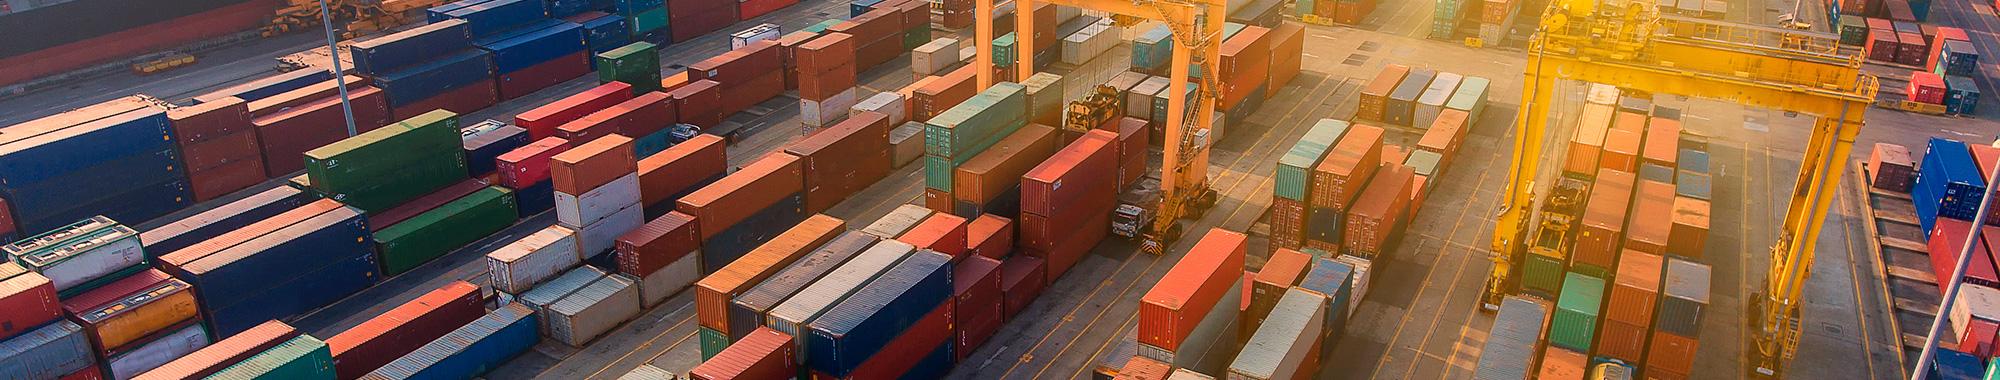 Transporte marítimo en contenedor Reefer